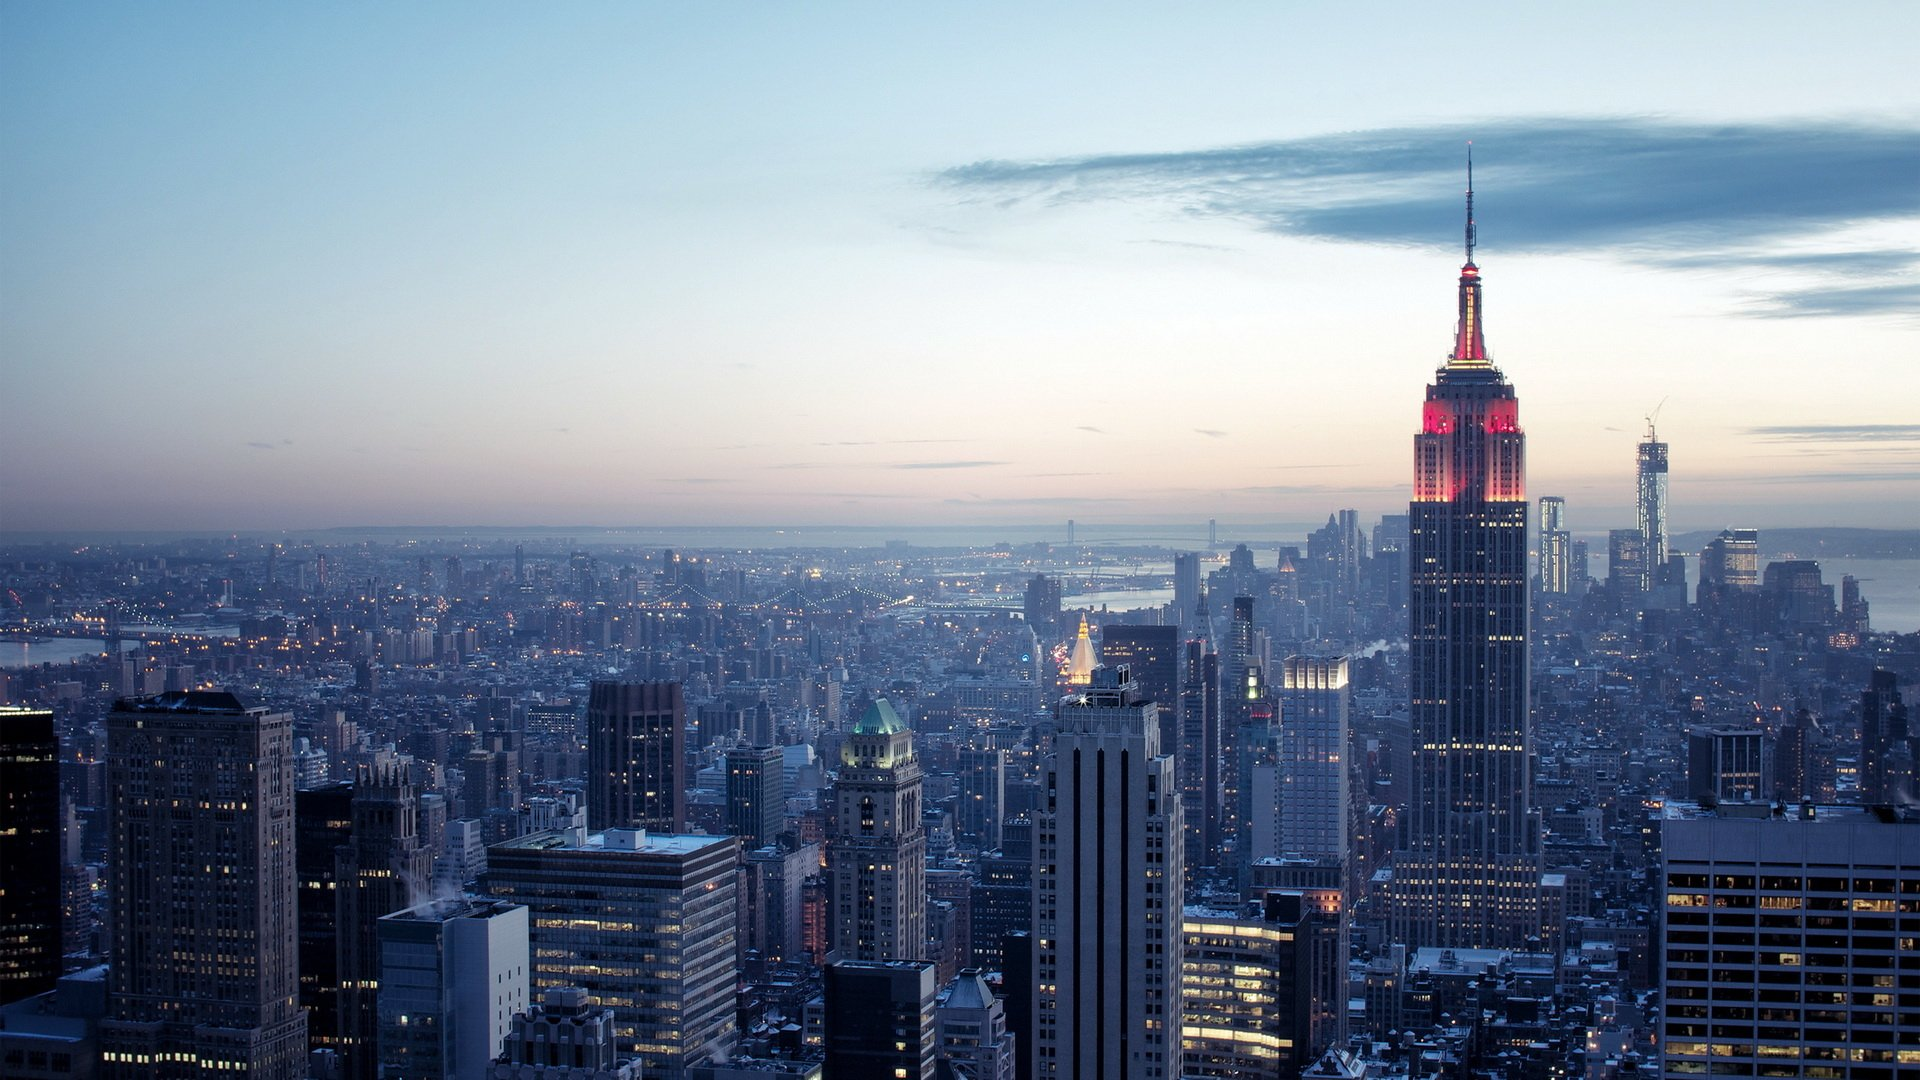 Best Wallpaper City Background - new-york-city-background-6  Graphic_194758 .jpg